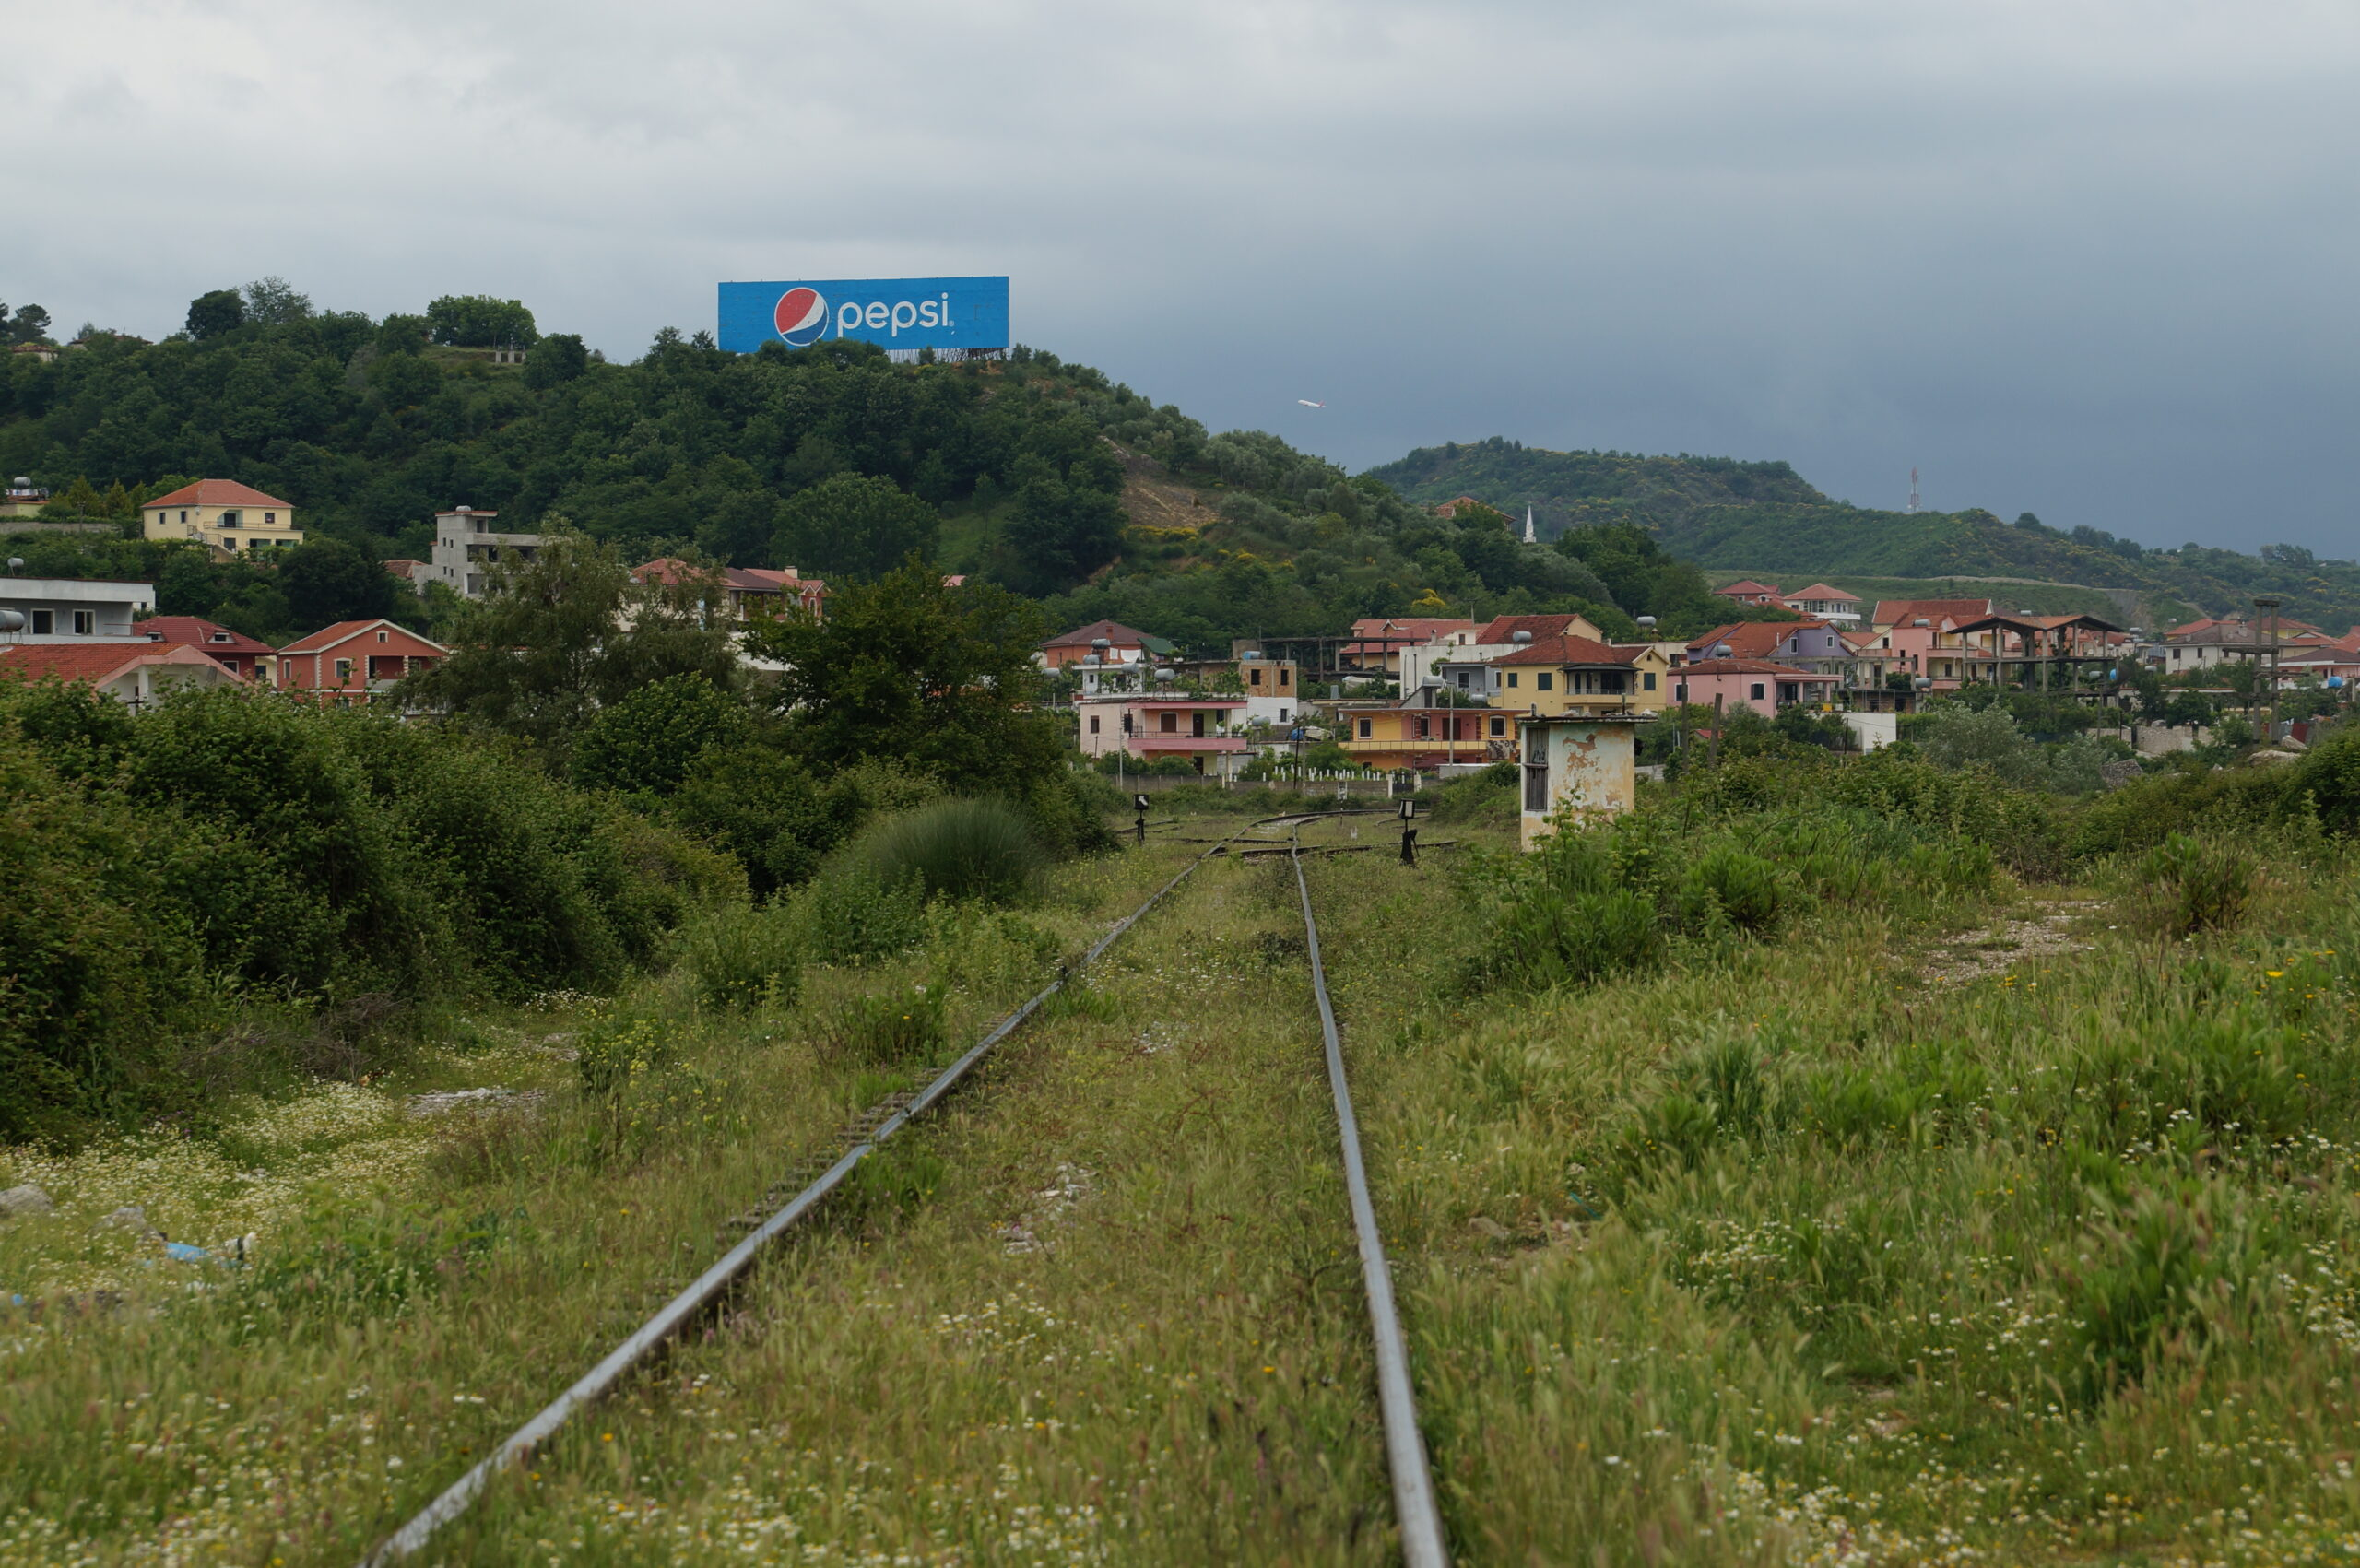 Outside Vora station on the Durrës-Tirana line